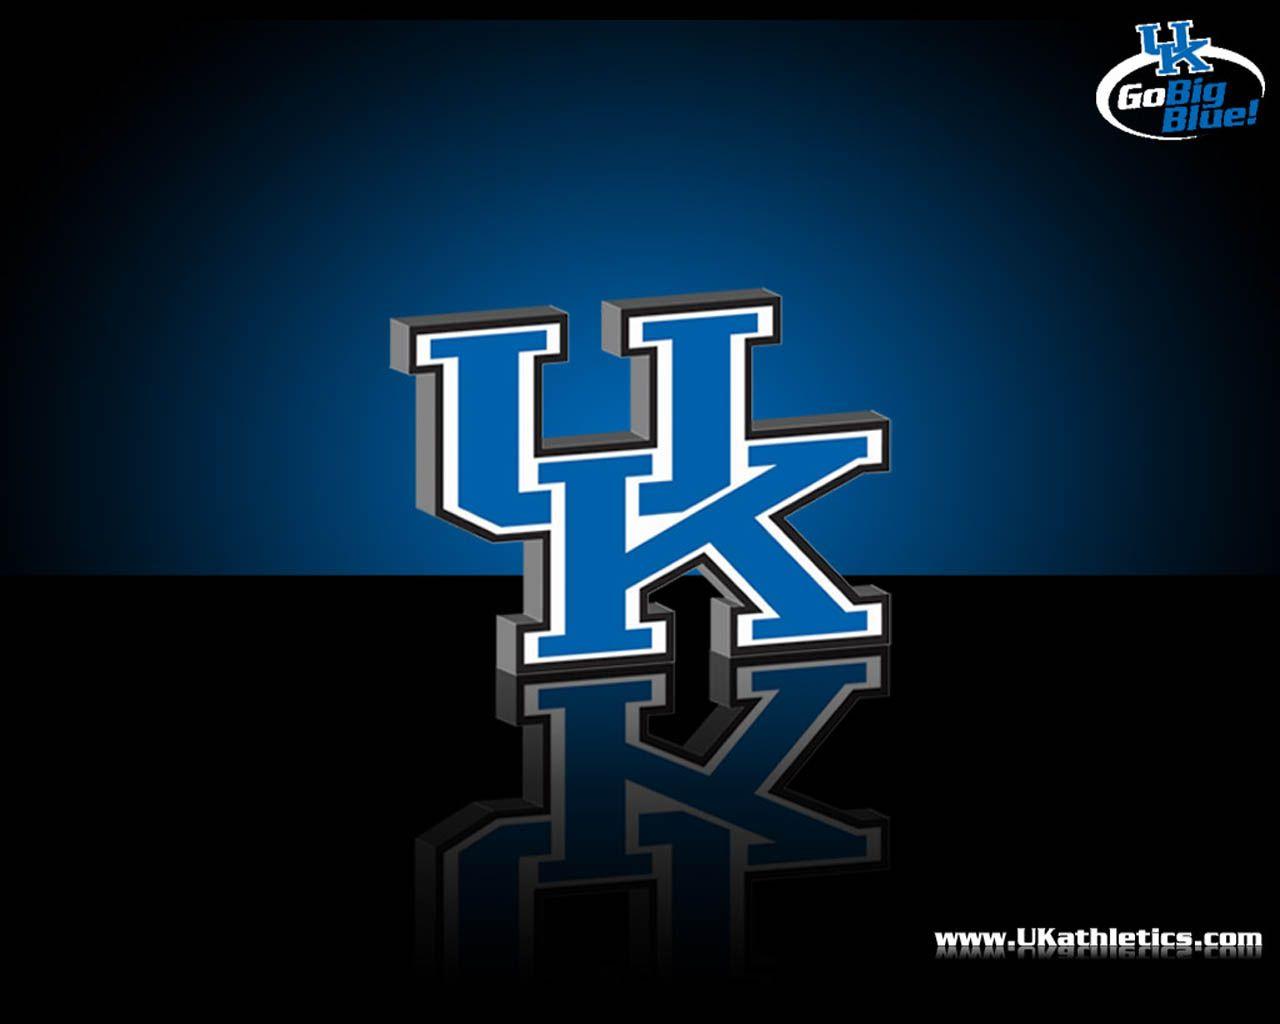 Kentucky Wildcats Wallpapers Download Free Kentucky